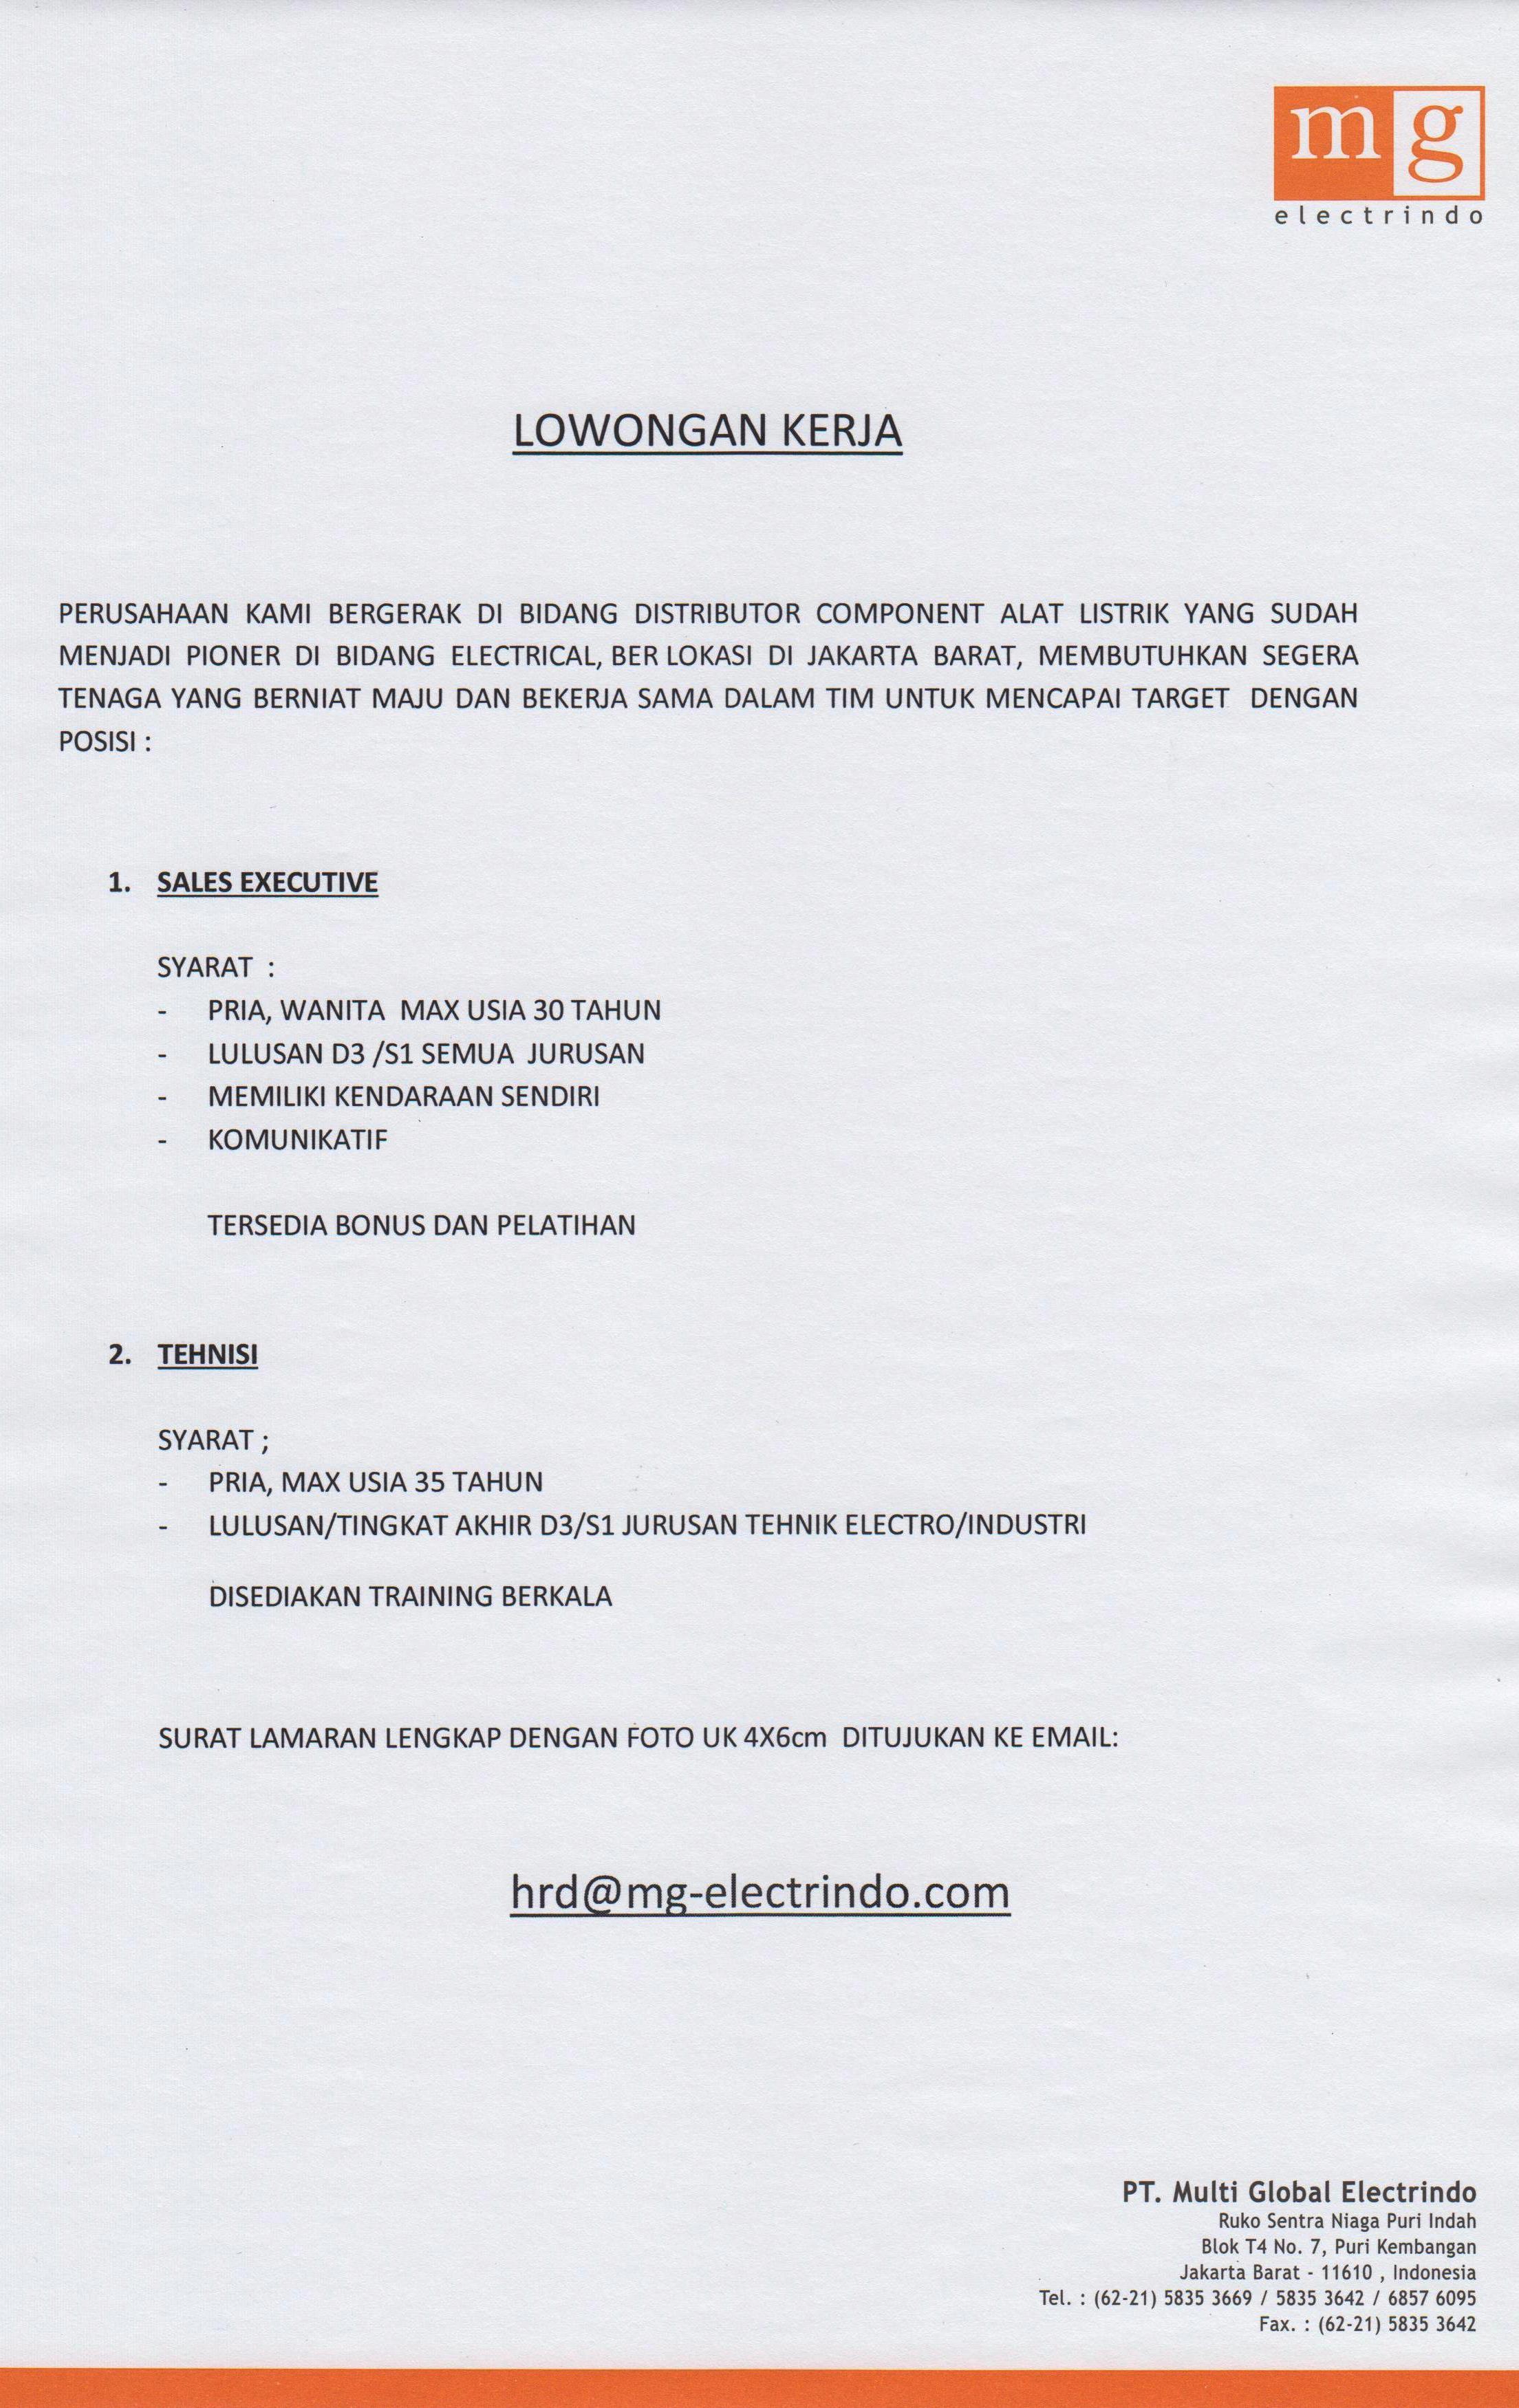 PT. Multi Global Electrindo